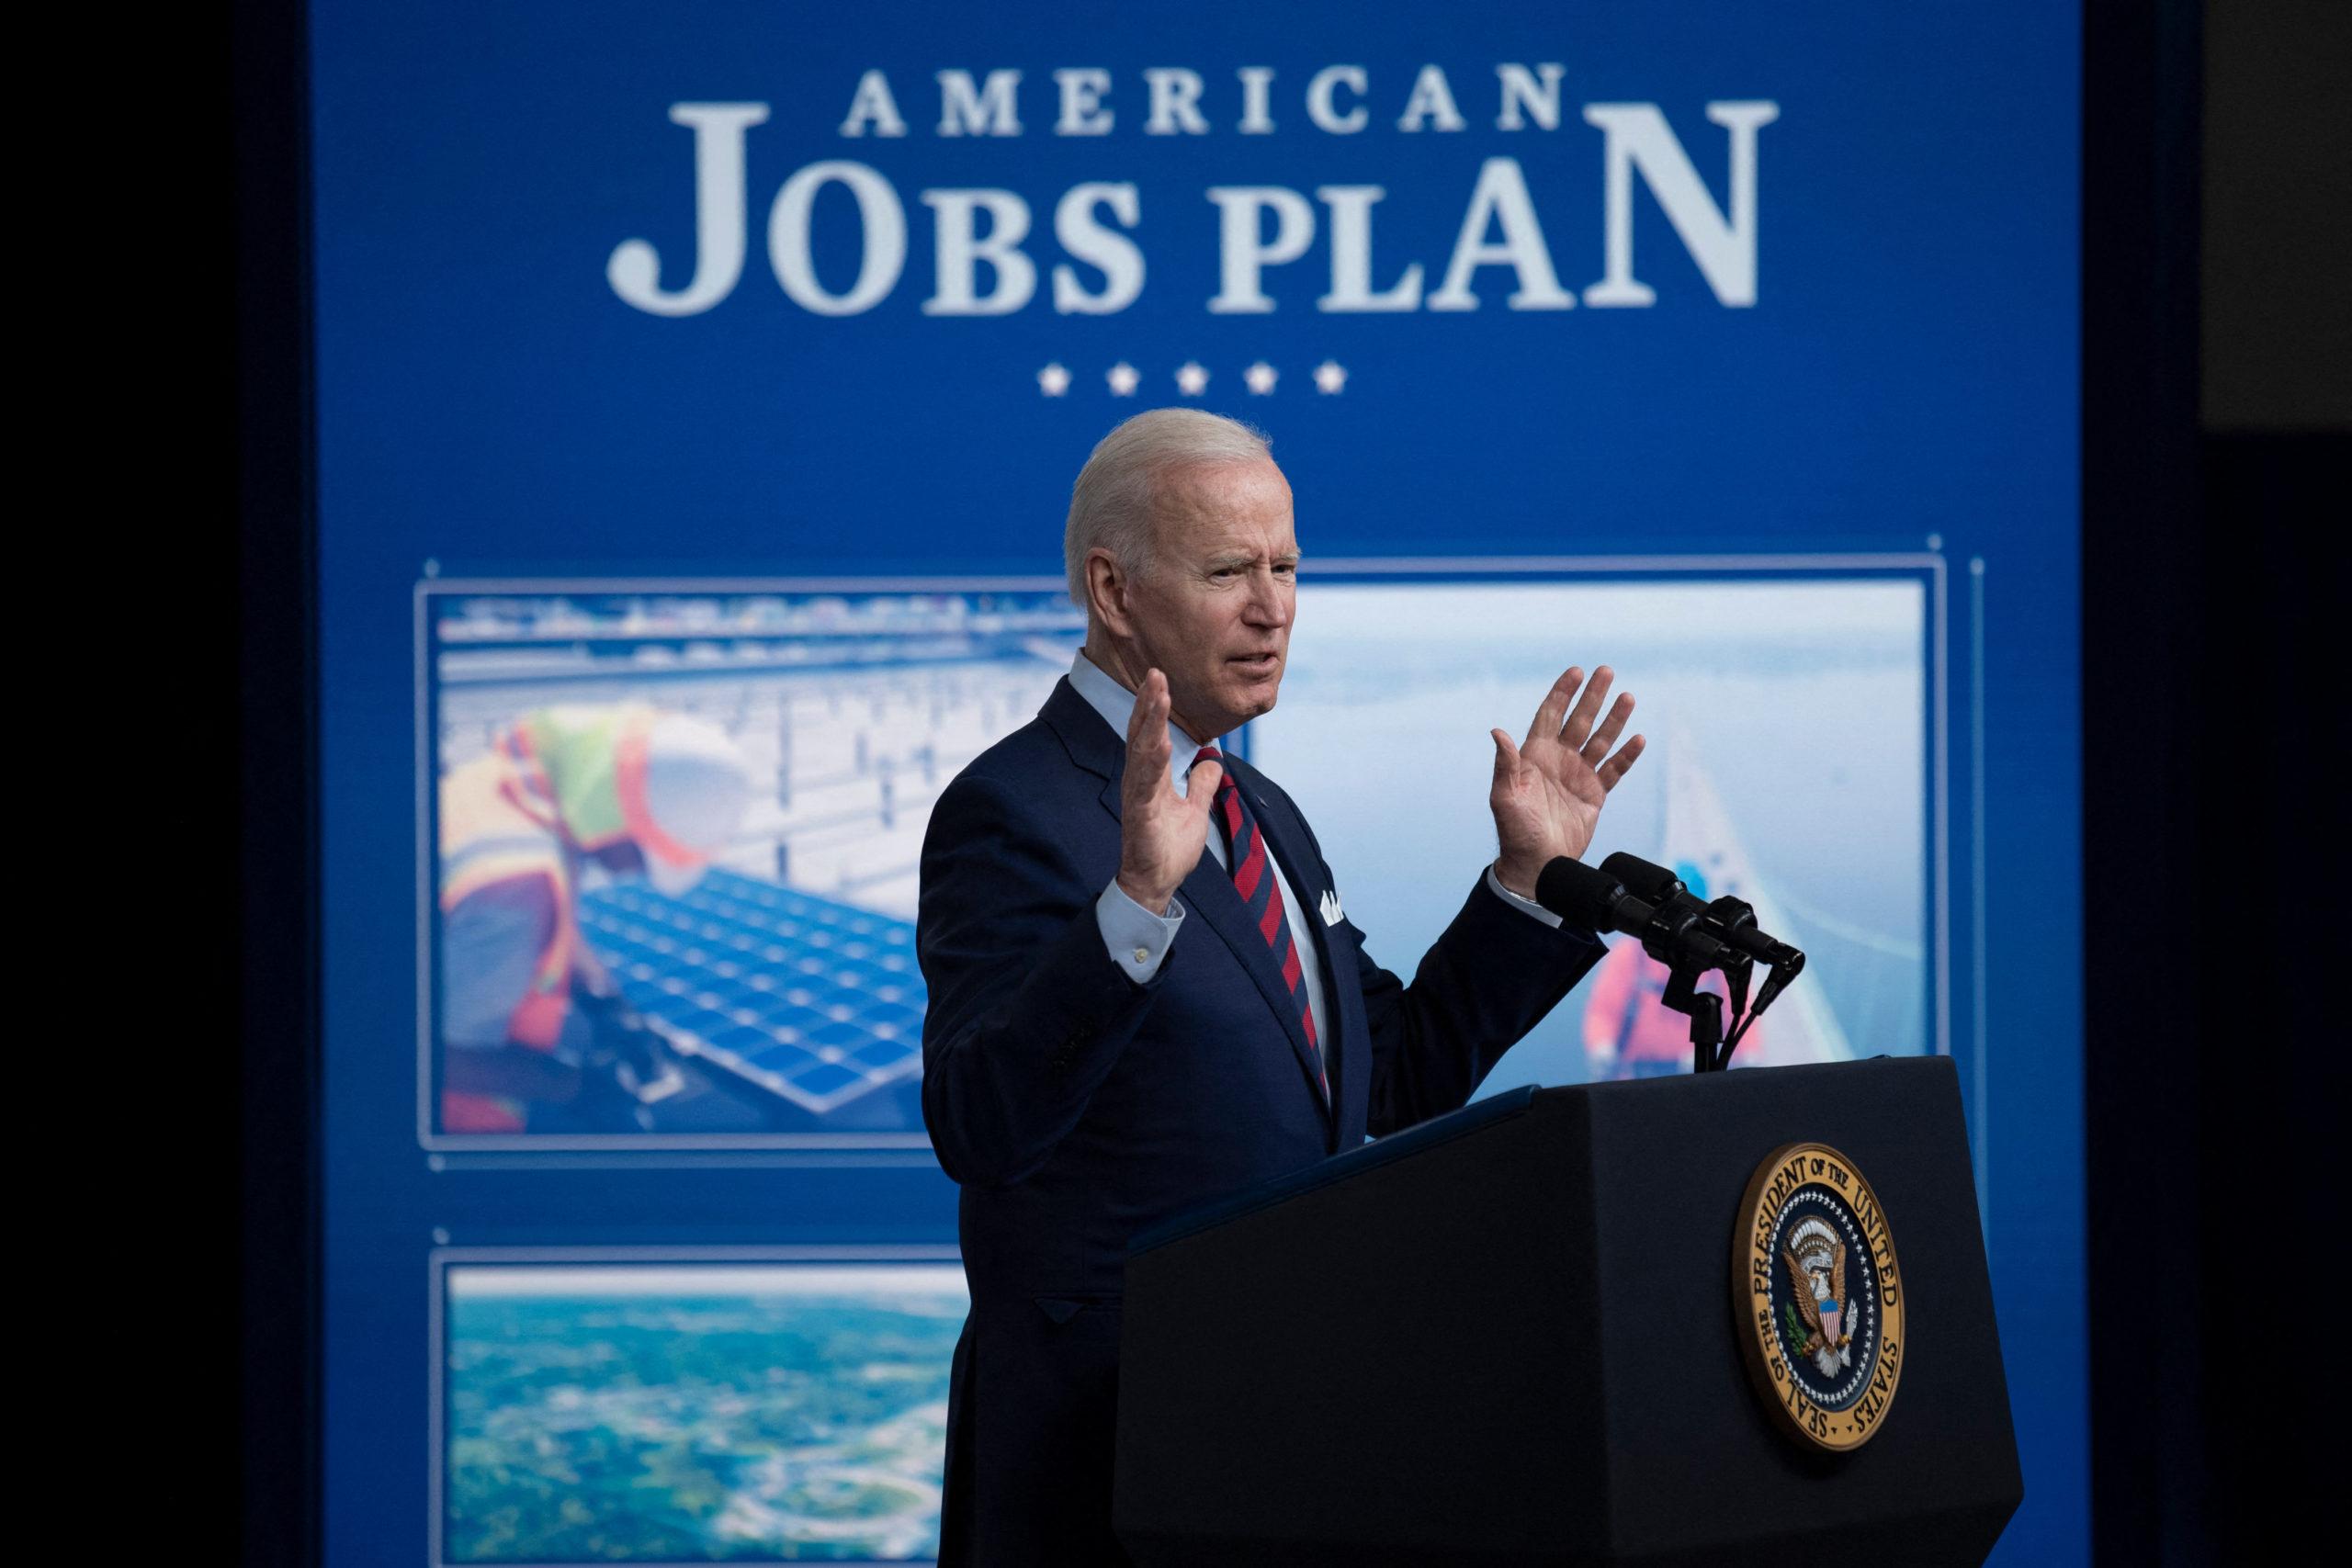 President Joe Biden speaks about his infrastructure plan on Wednesday. (Brendan Smialowski/AFP via Getty Images)